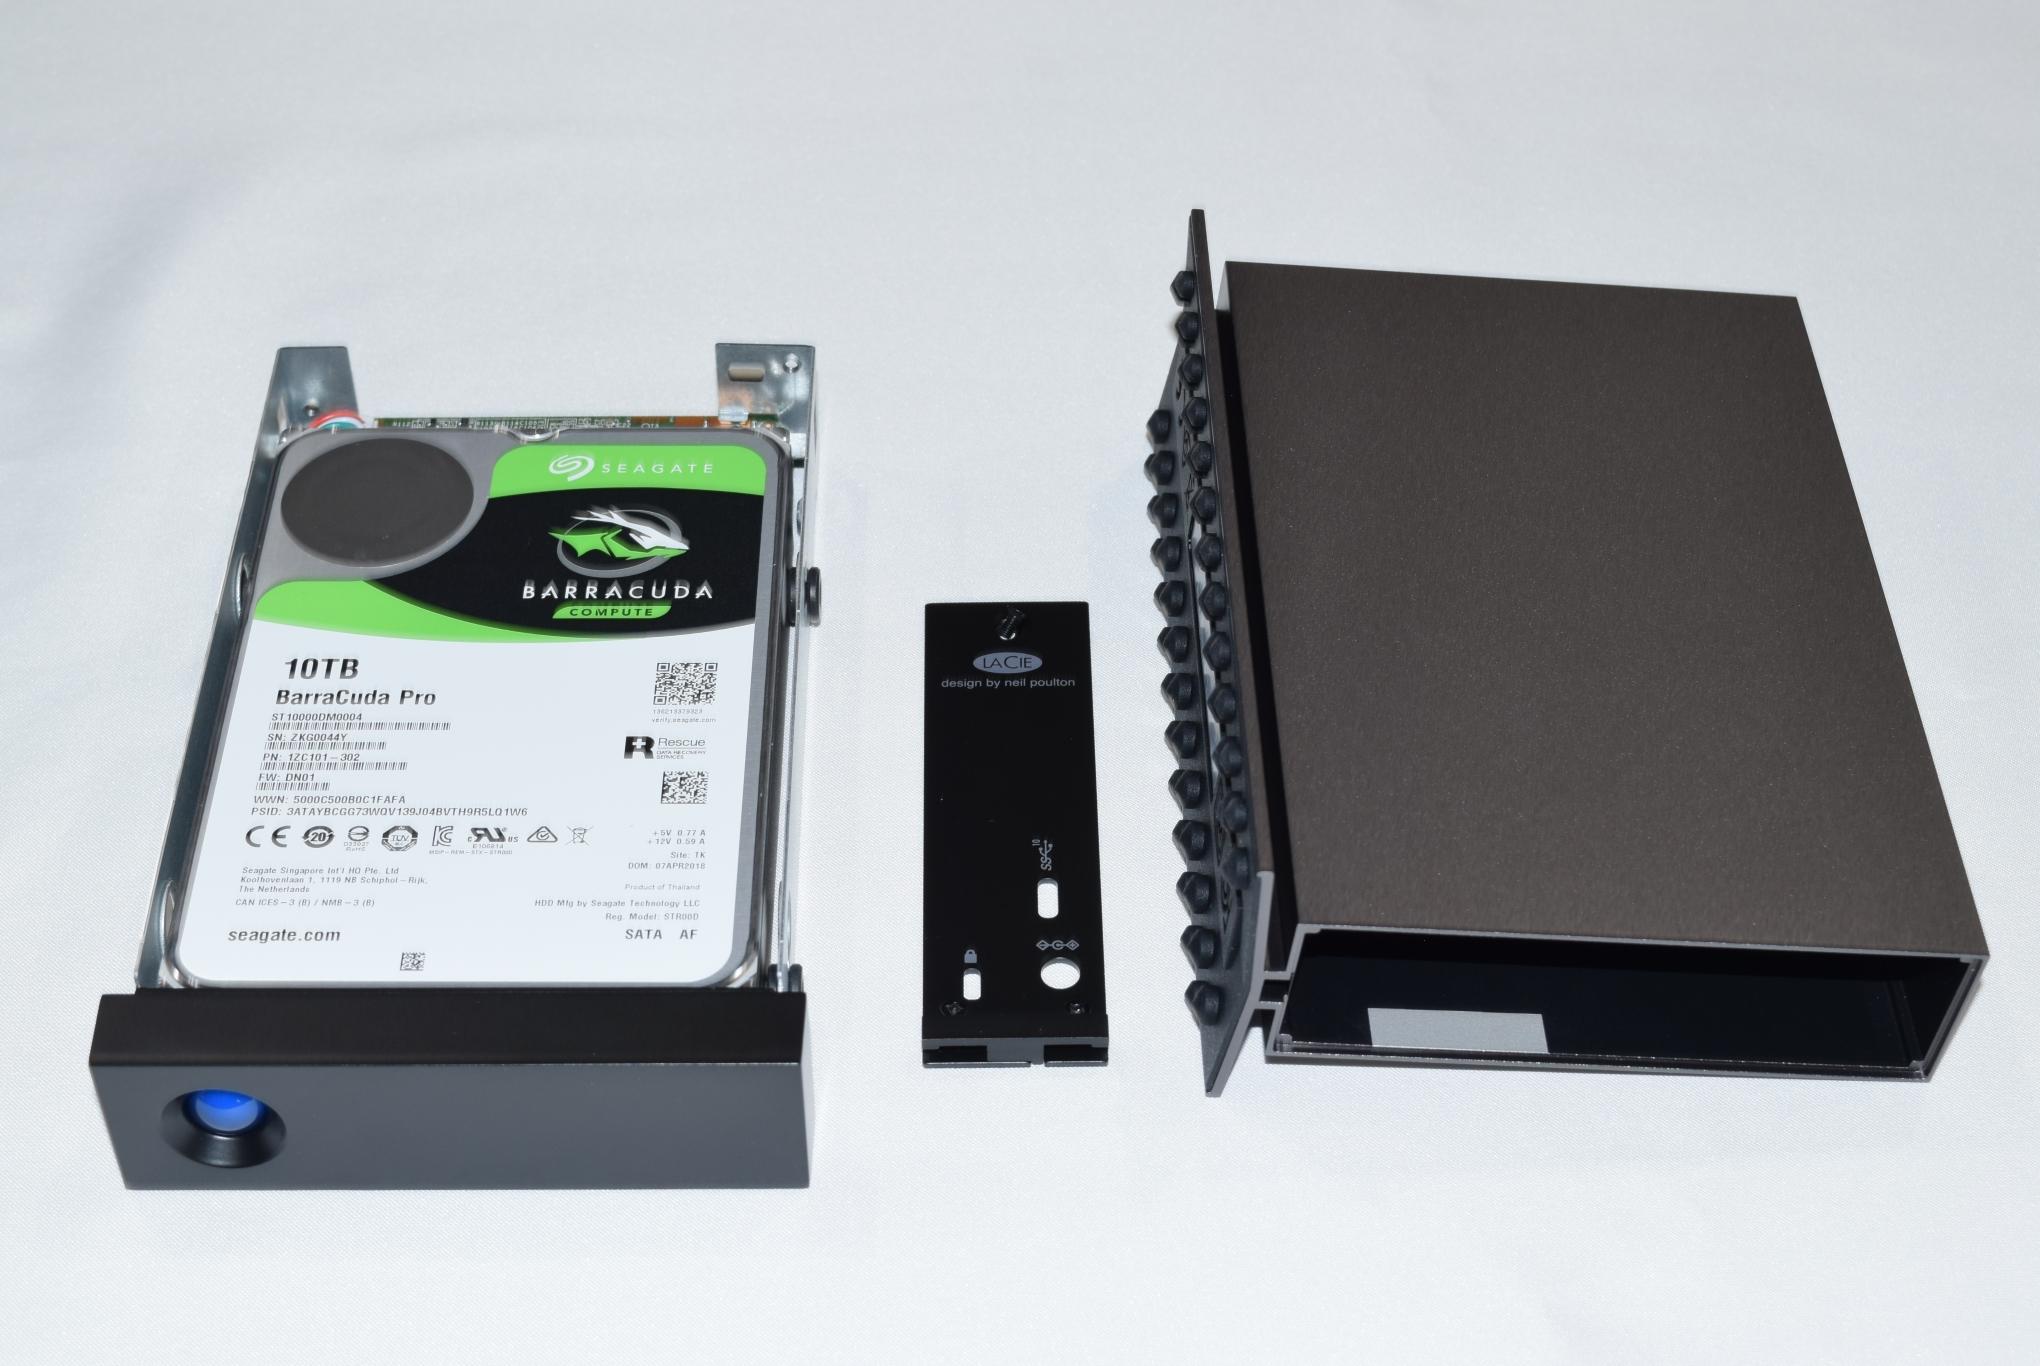 LaCie d2 Professional 10TB Direct-Attached Storage Capsule